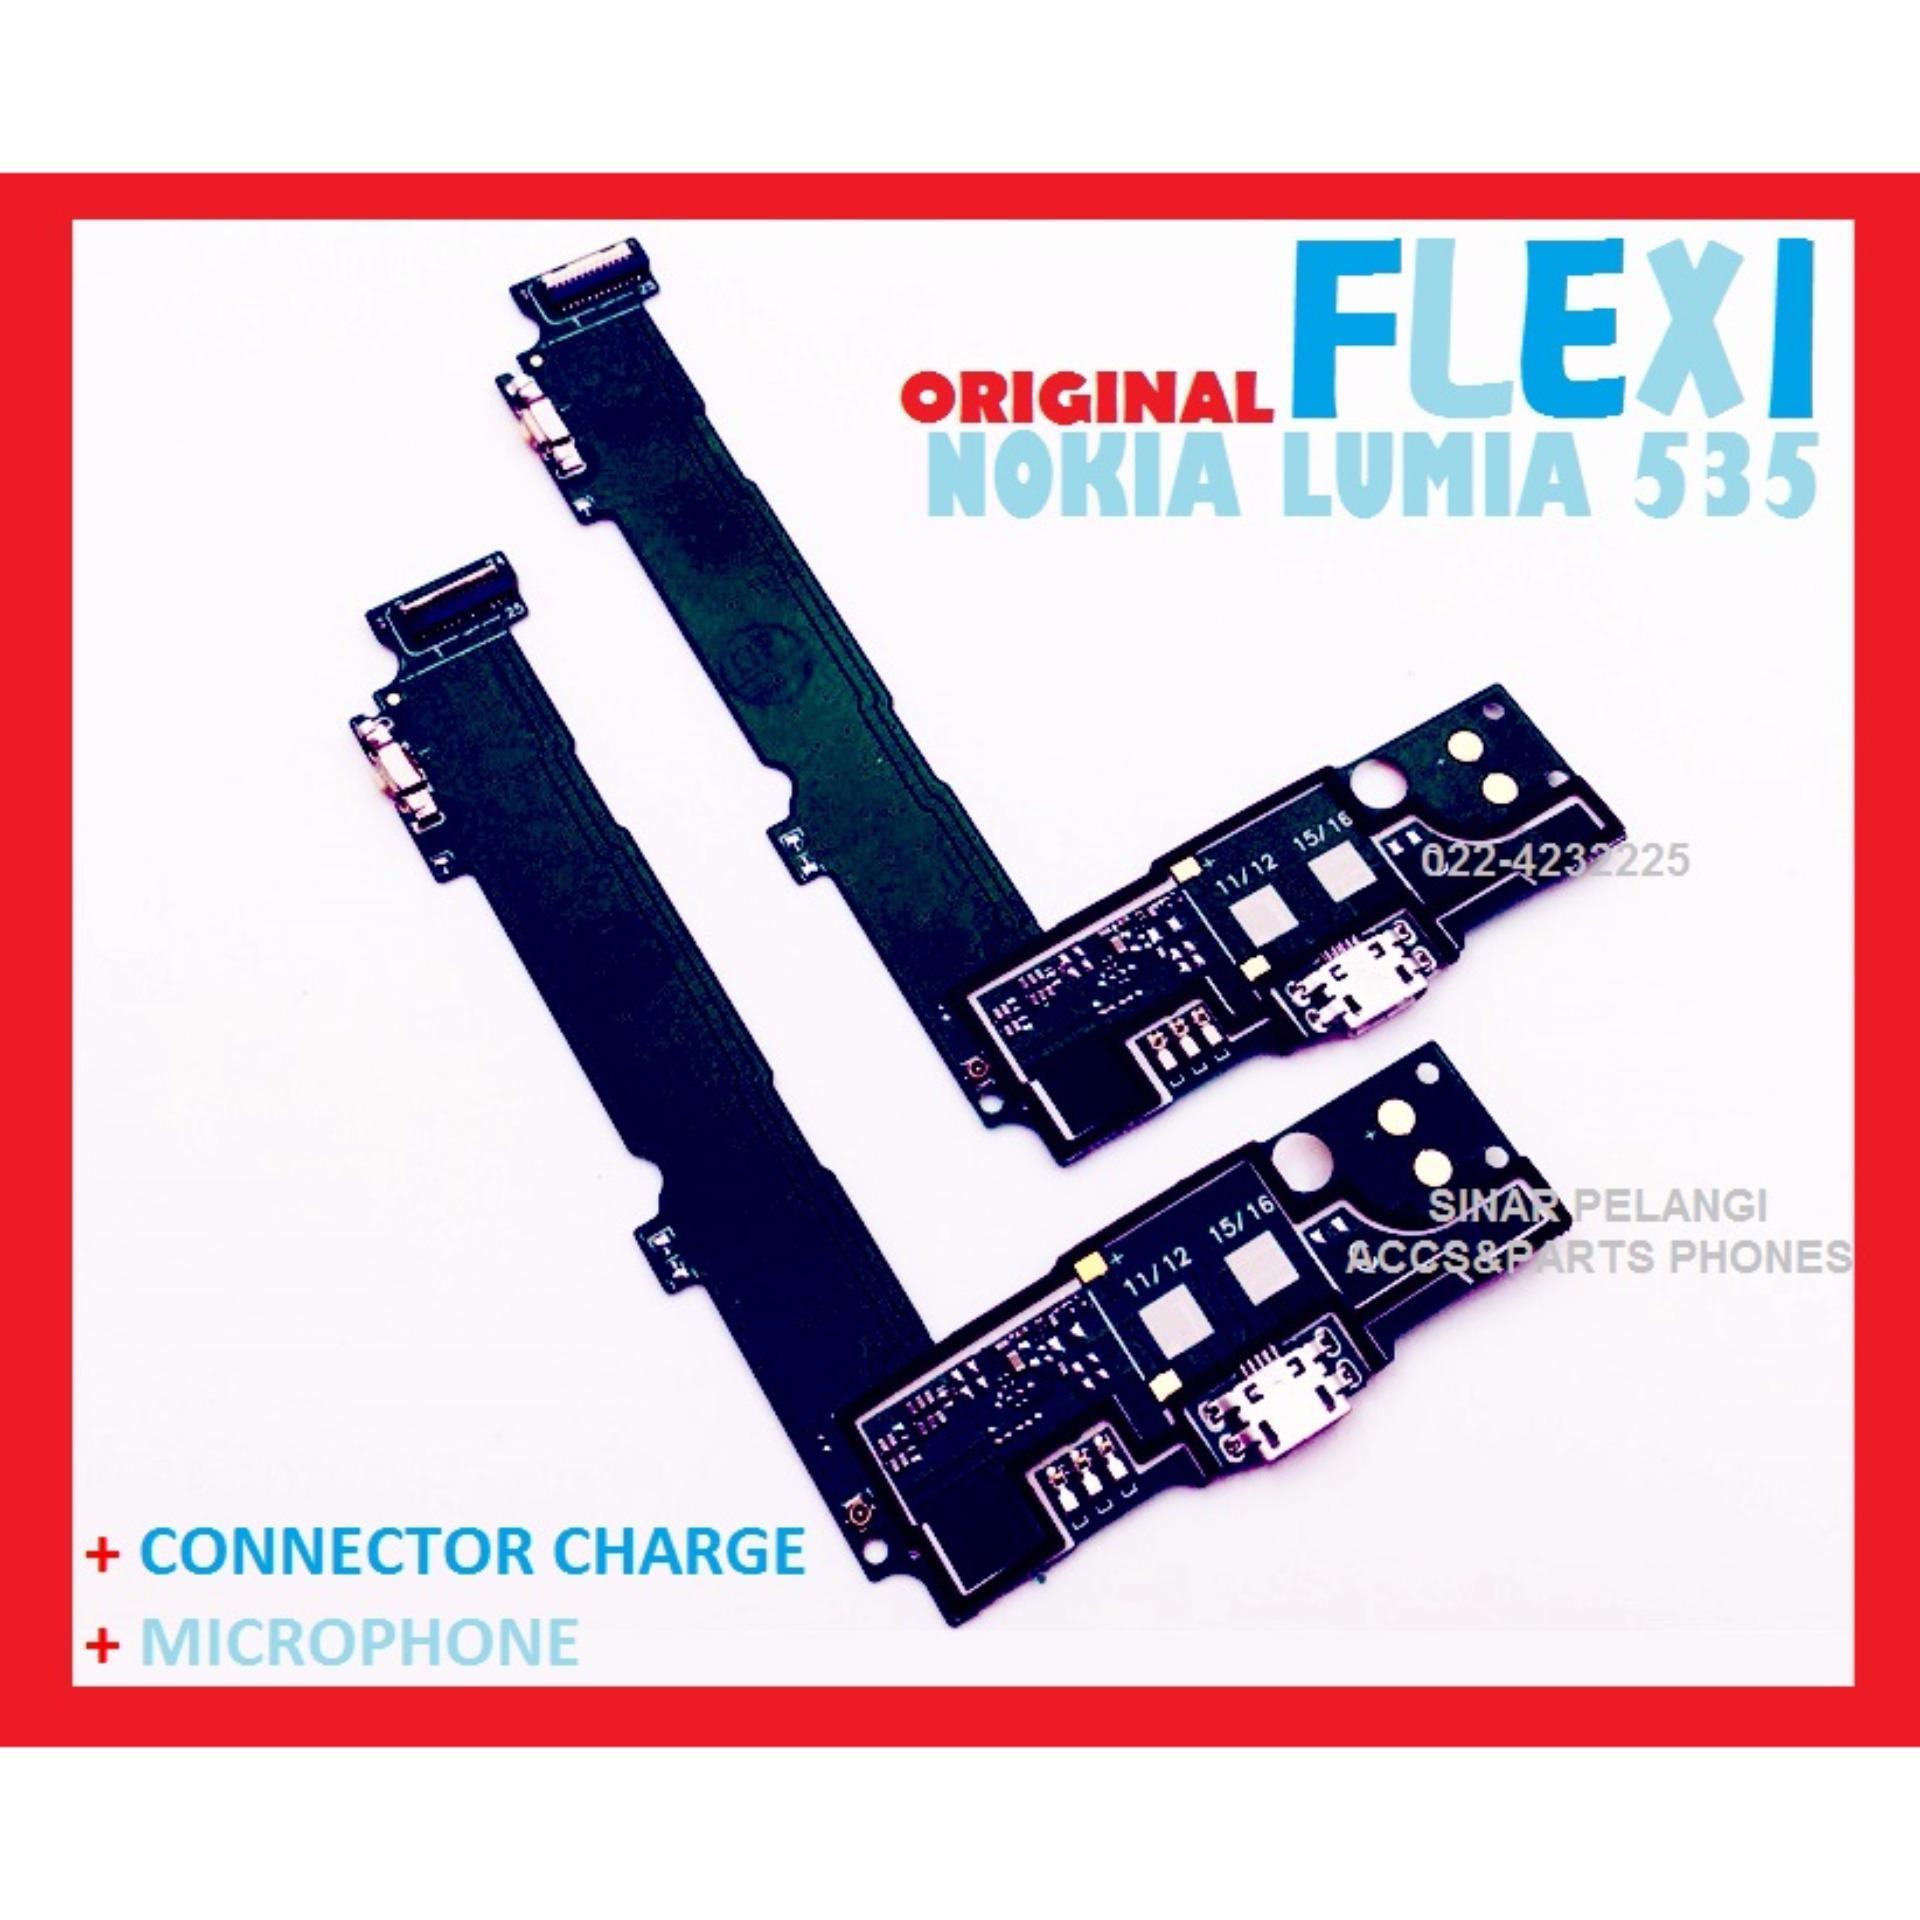 Cek Harga Baru Flexi Fleksi Connector Charger Mic Xiaomi Redmi Note 4g Dual Sim Putih Nokia Lumia 535 Flex Flexible Fleksibel Port Konektor Microphone Ori Original 905444